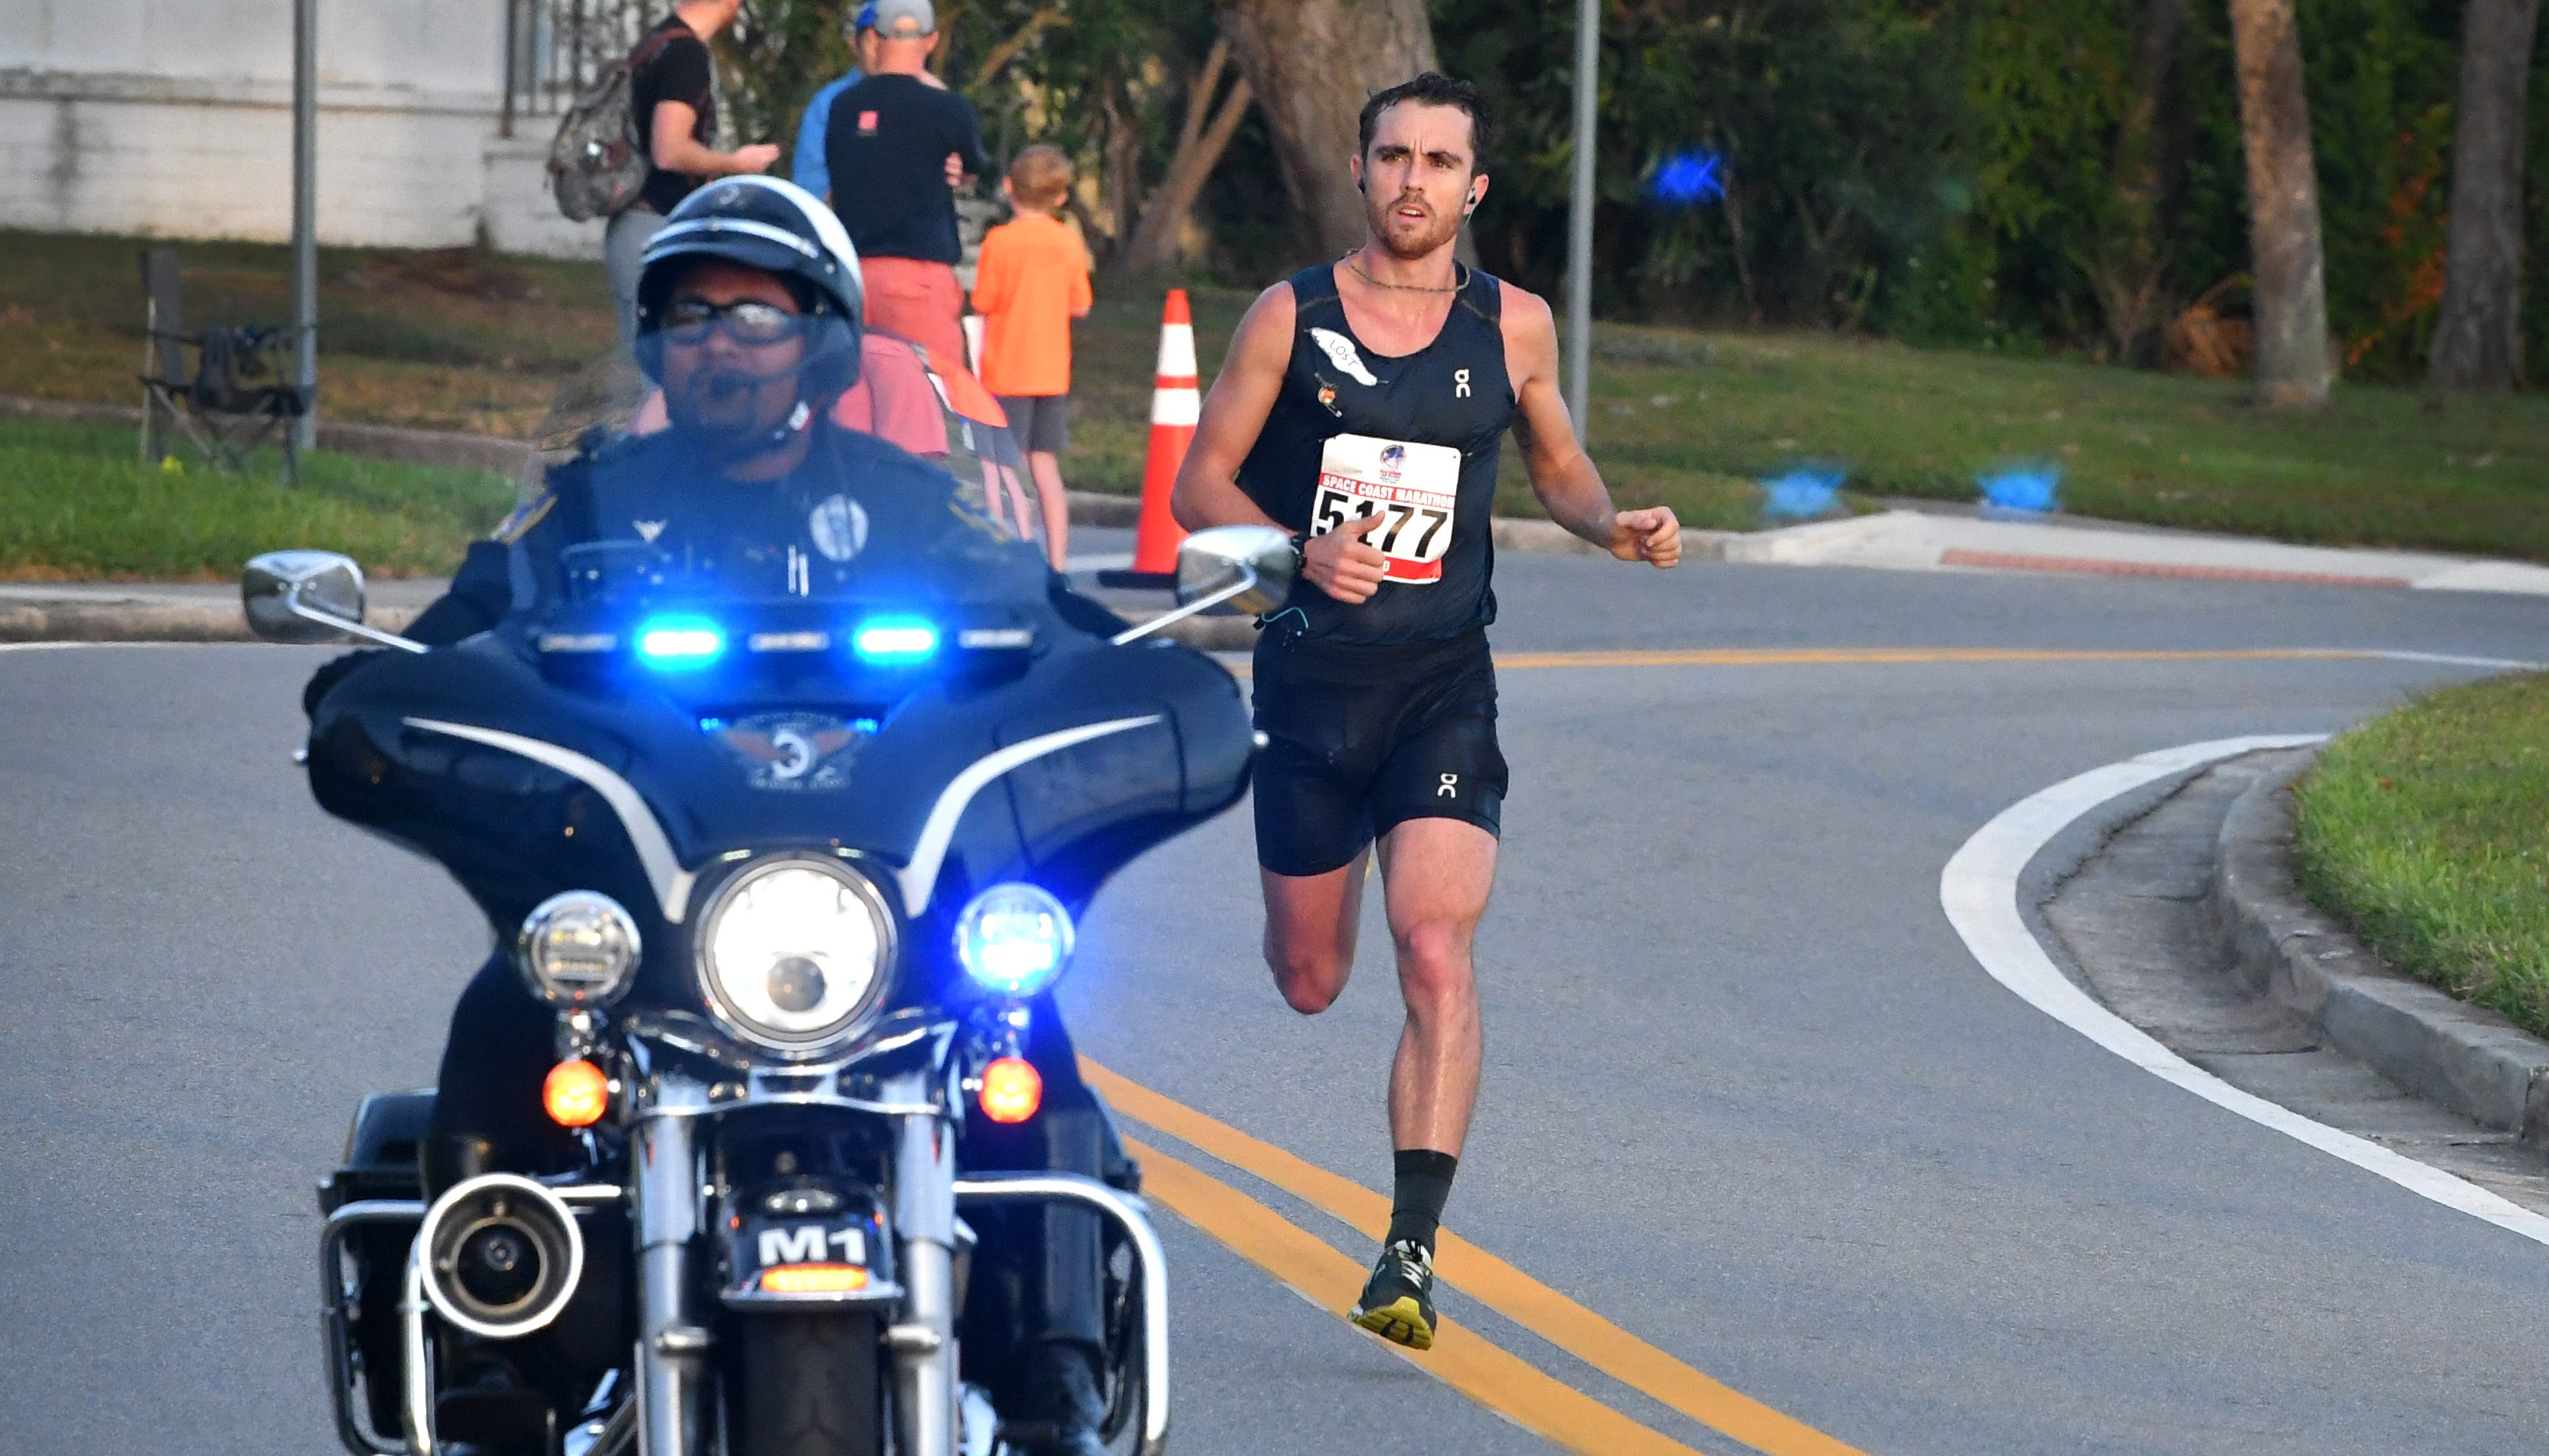 David Kilgore Picks Up Fourth Win At Space Coast Marathon